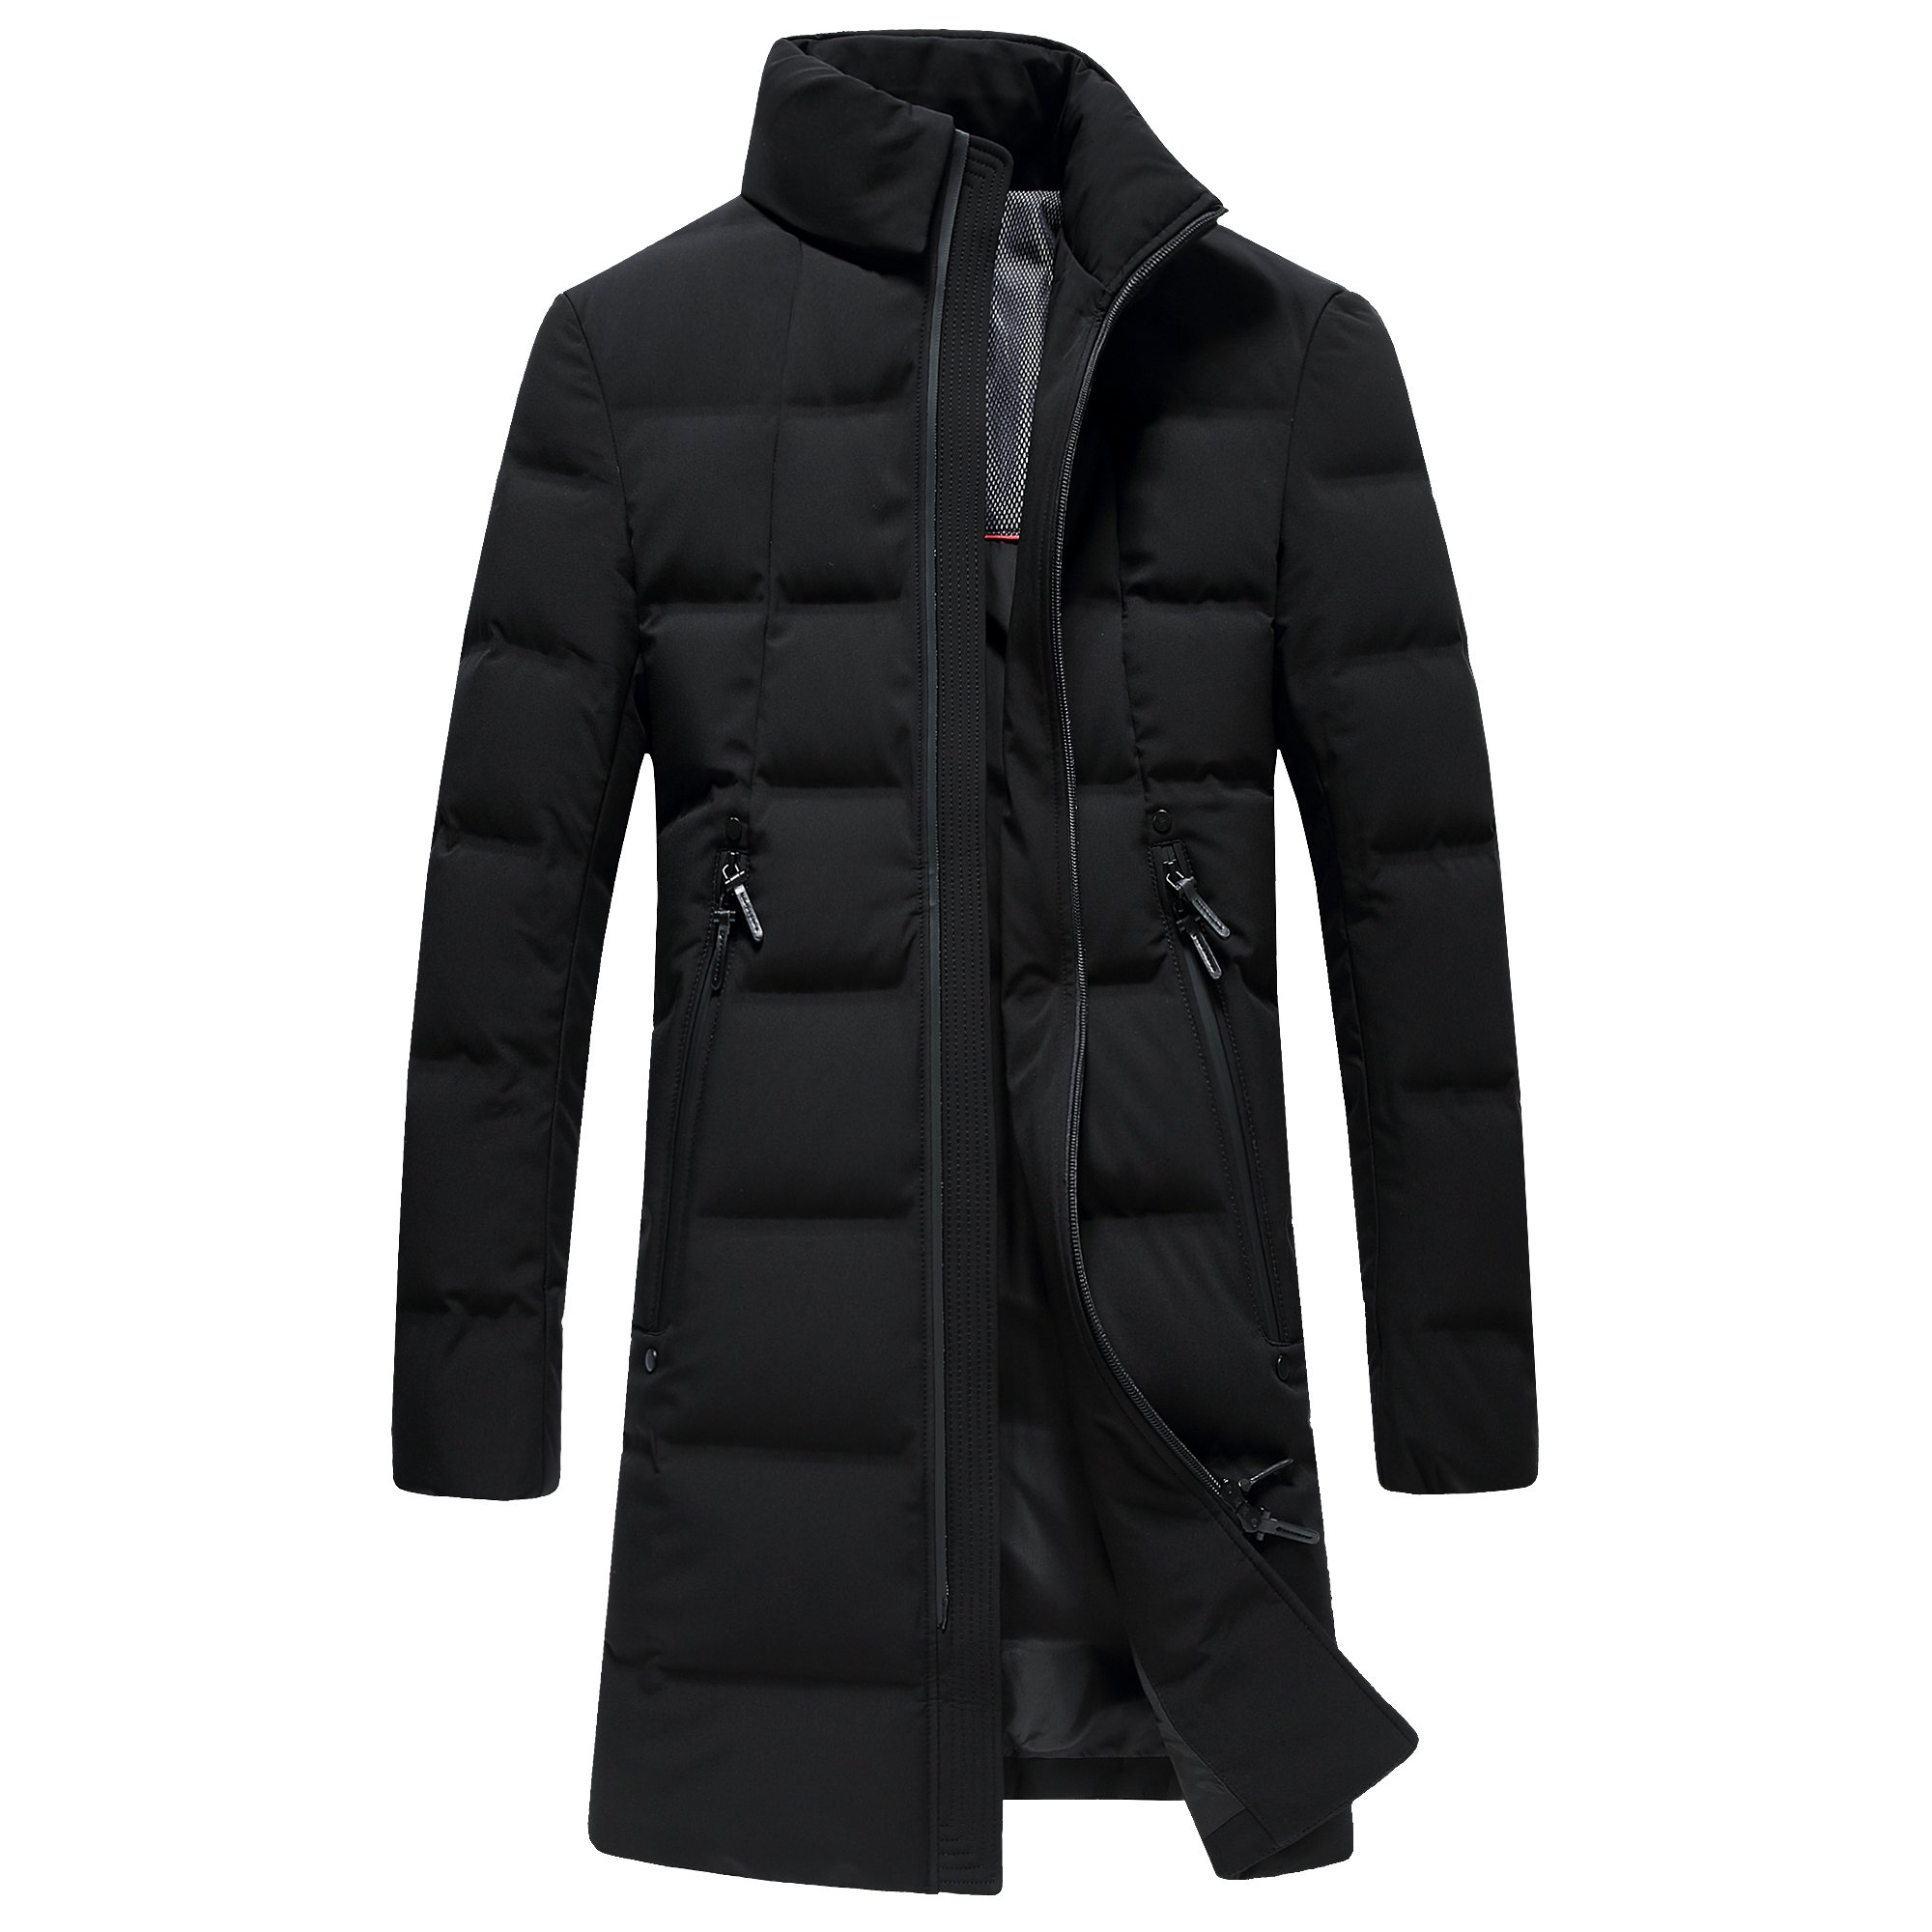 SUNNY SHOP Packable Down Jacket Men Long Winter Sale Thick White Duck Down Coat With Bag Zipper Pocket (Black, XXXL) by SUNNY SHOP